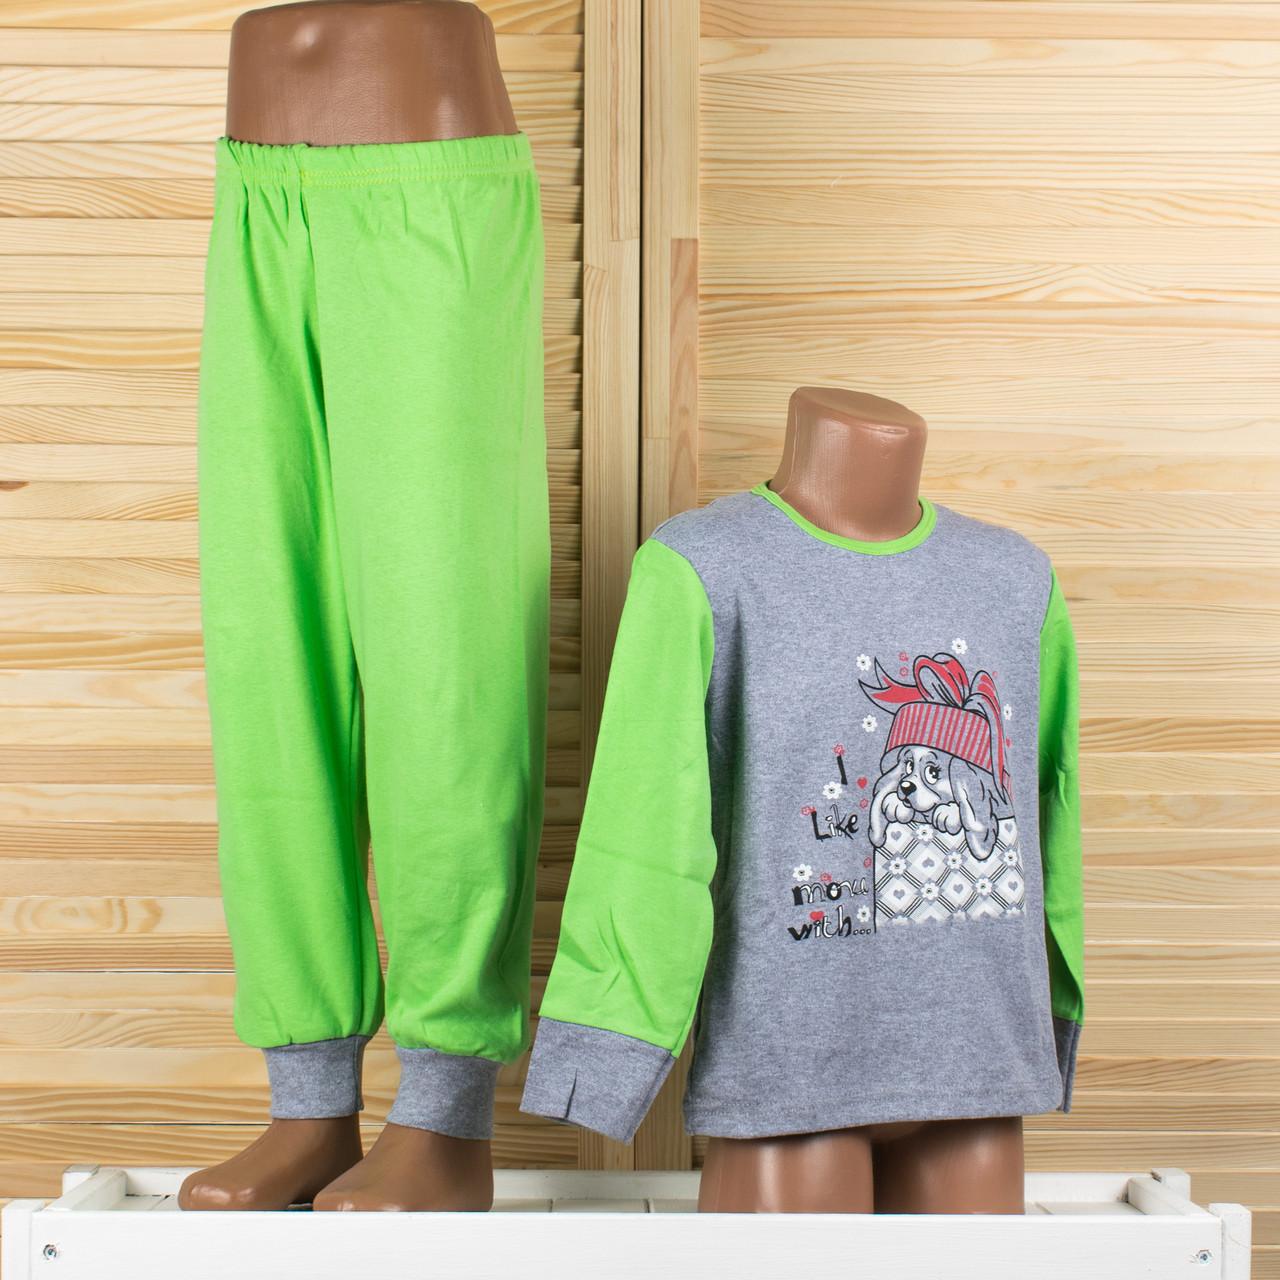 Детская пижама на девочку Турция. Moral 05-1 2/3. Размер на 2/3 года.